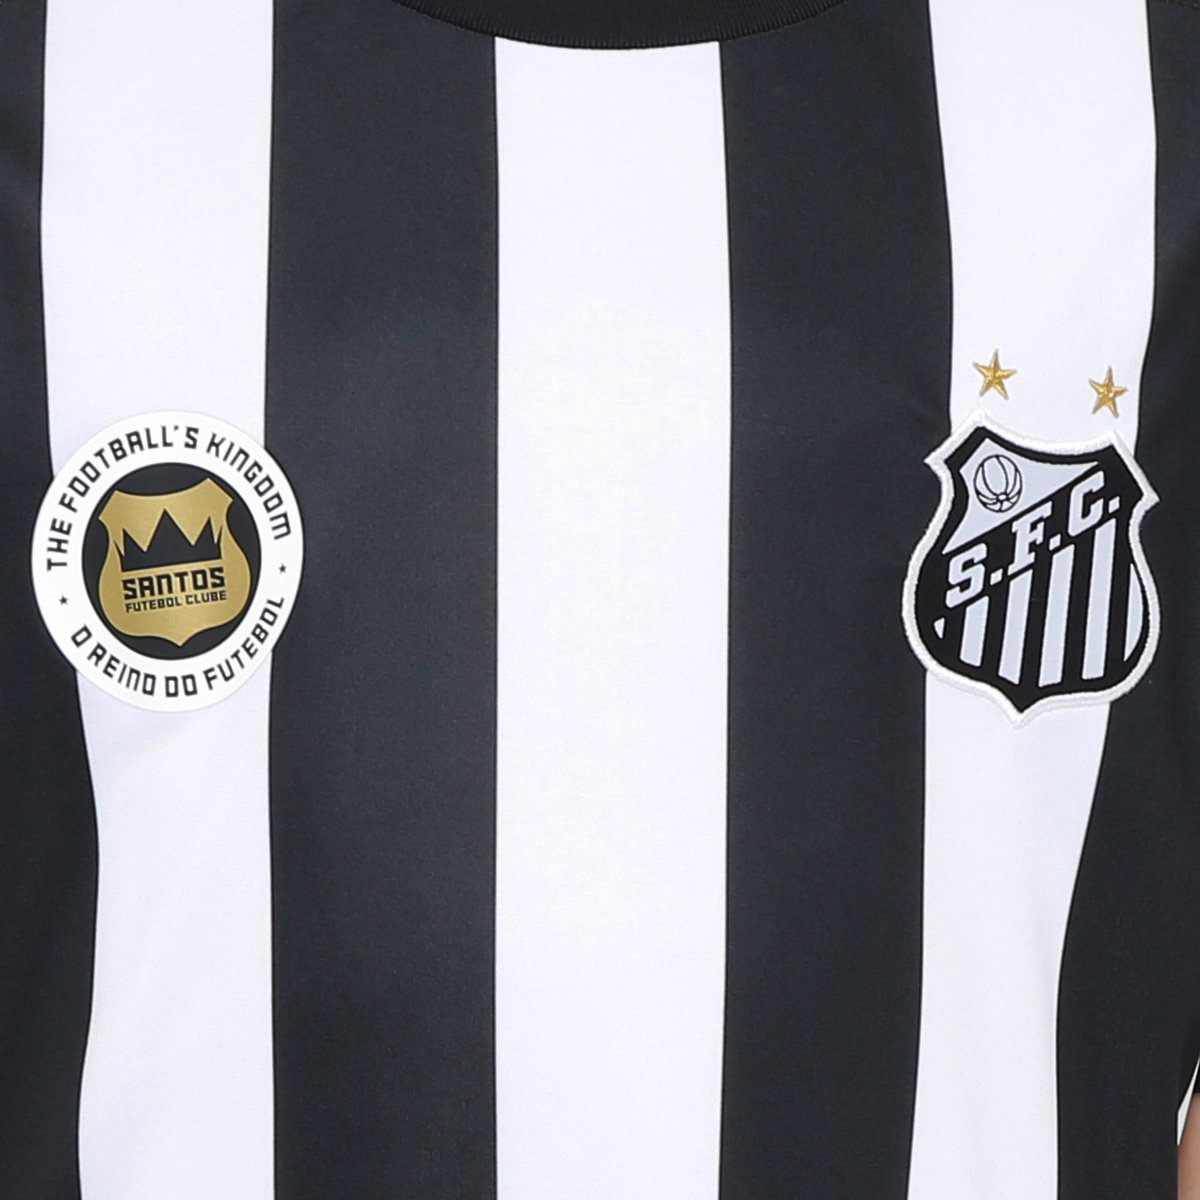 9449f803b90af Camisa Santos Infantil II 17 18 s nº Réplica Torcedor Kappa - Preto e Branco